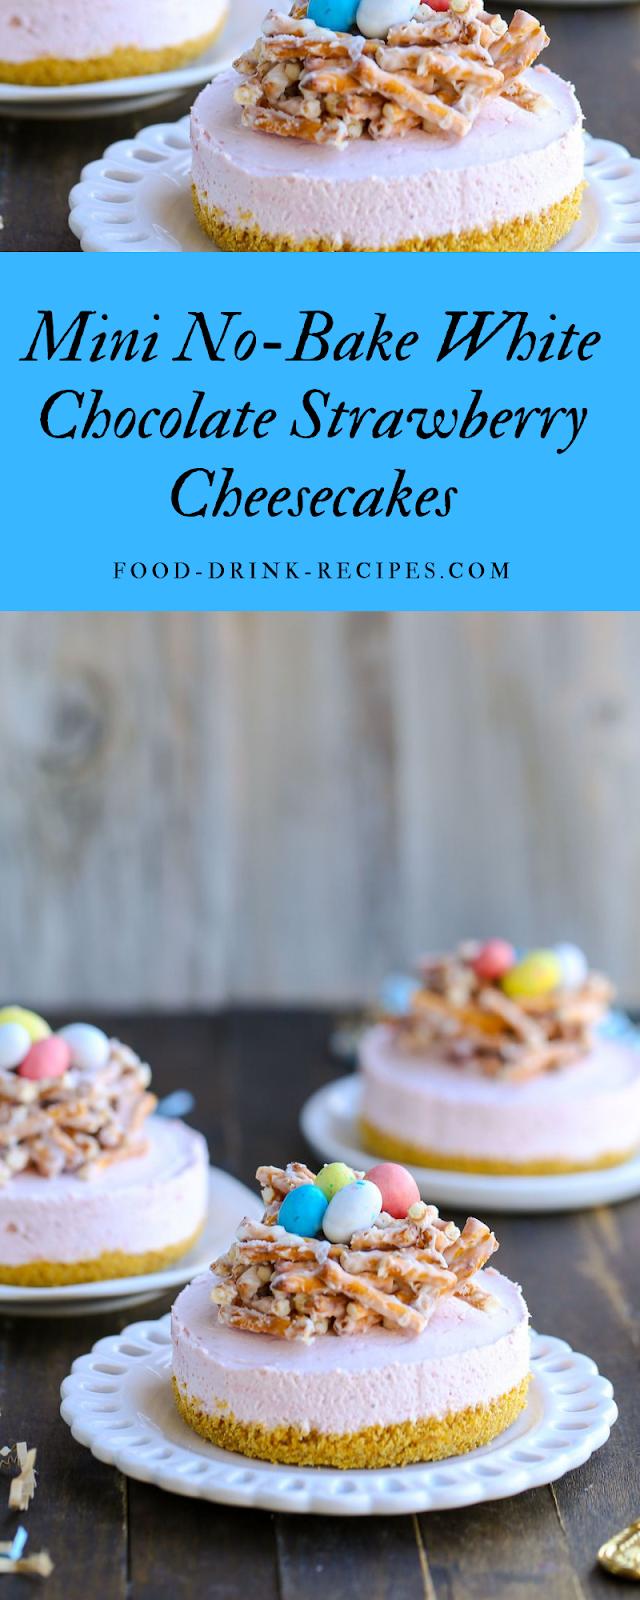 Mini No-Bake White Chocolate Strawberry Cheesecakes - food-drink-recipes.com